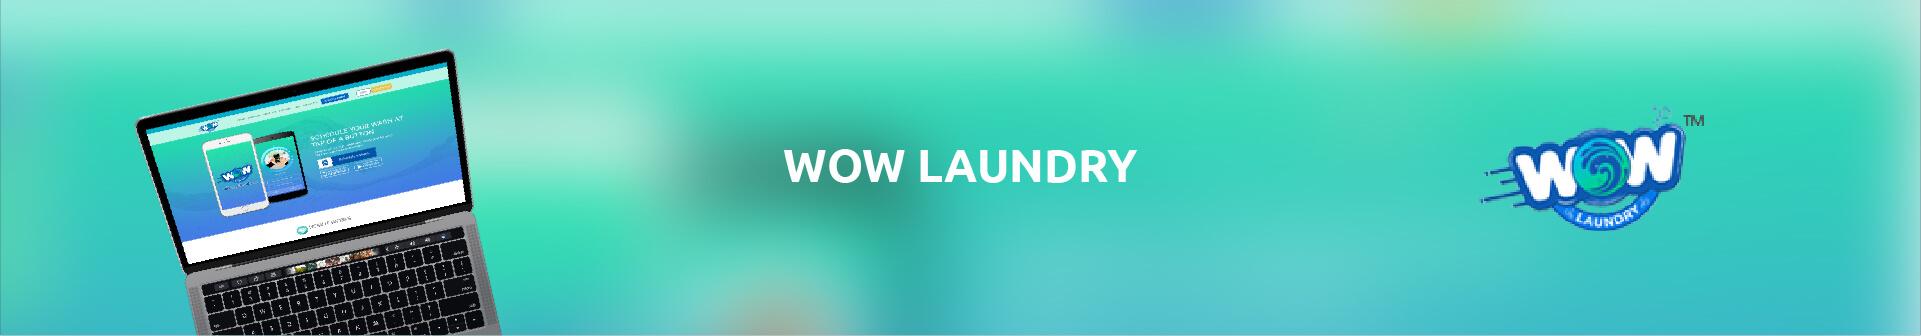 WOW Laundry App